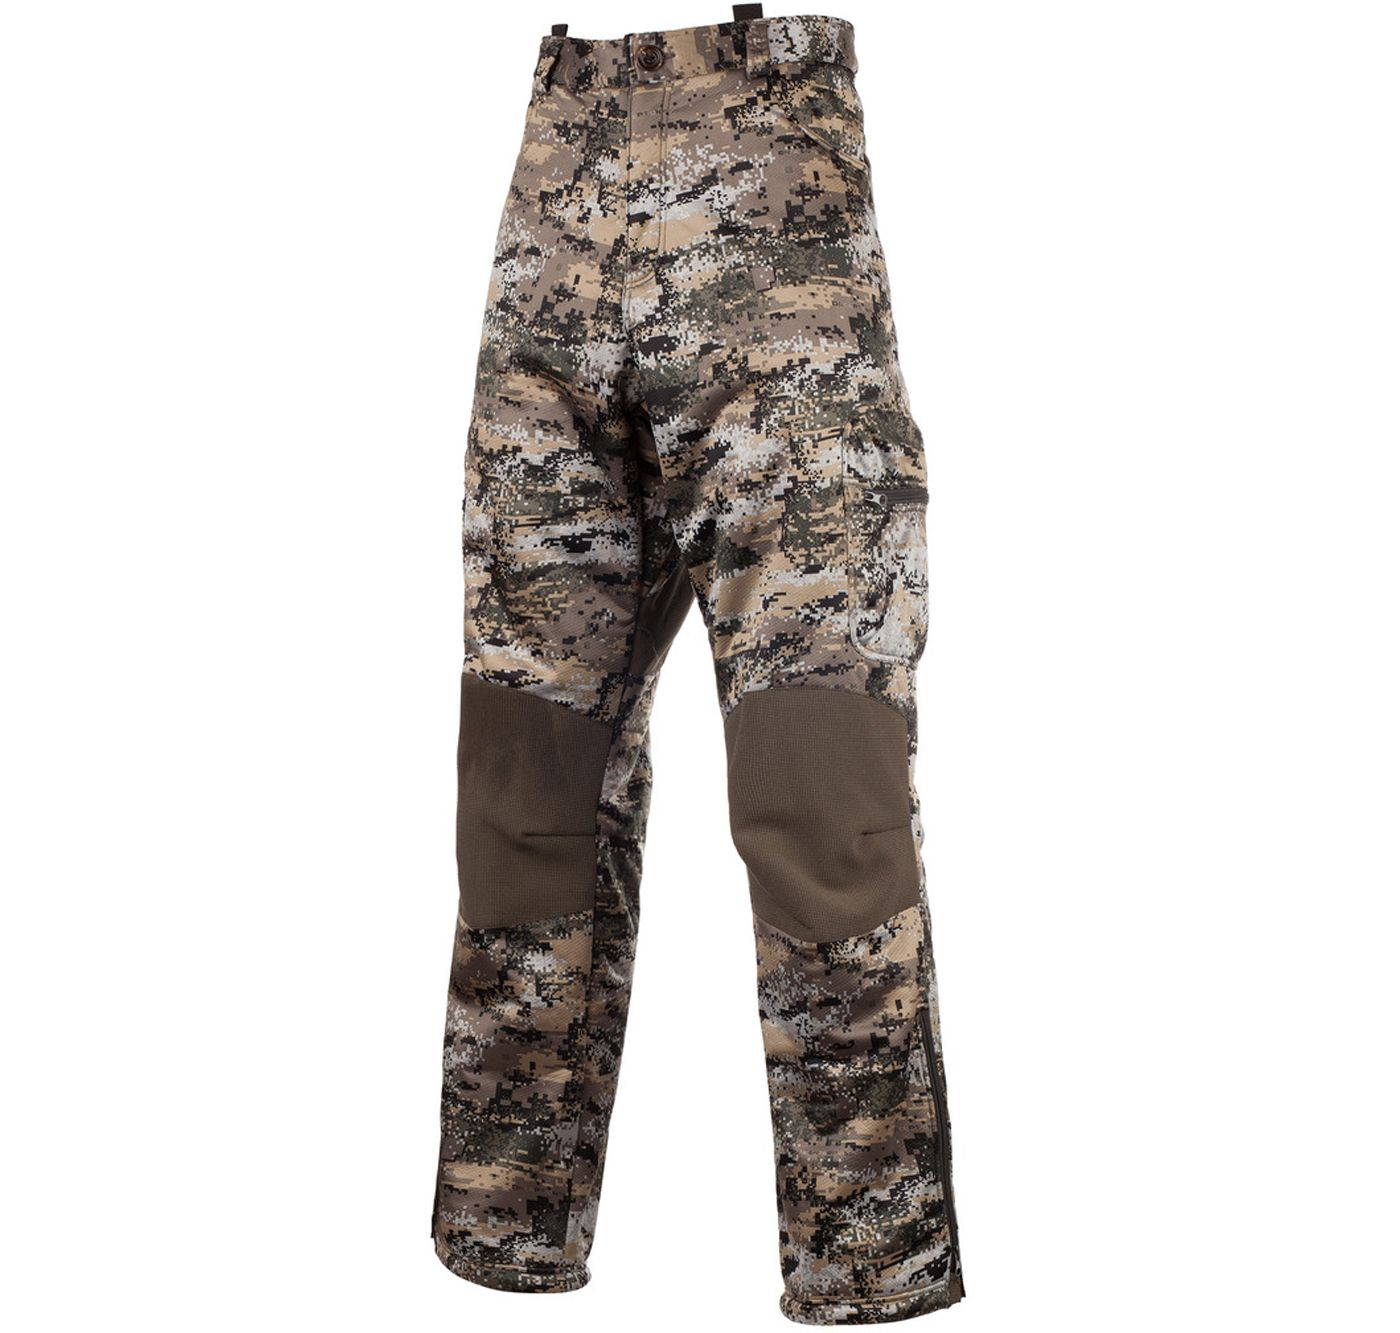 Huntworth Men's Heavyweight Soft Shell Hunting Pants